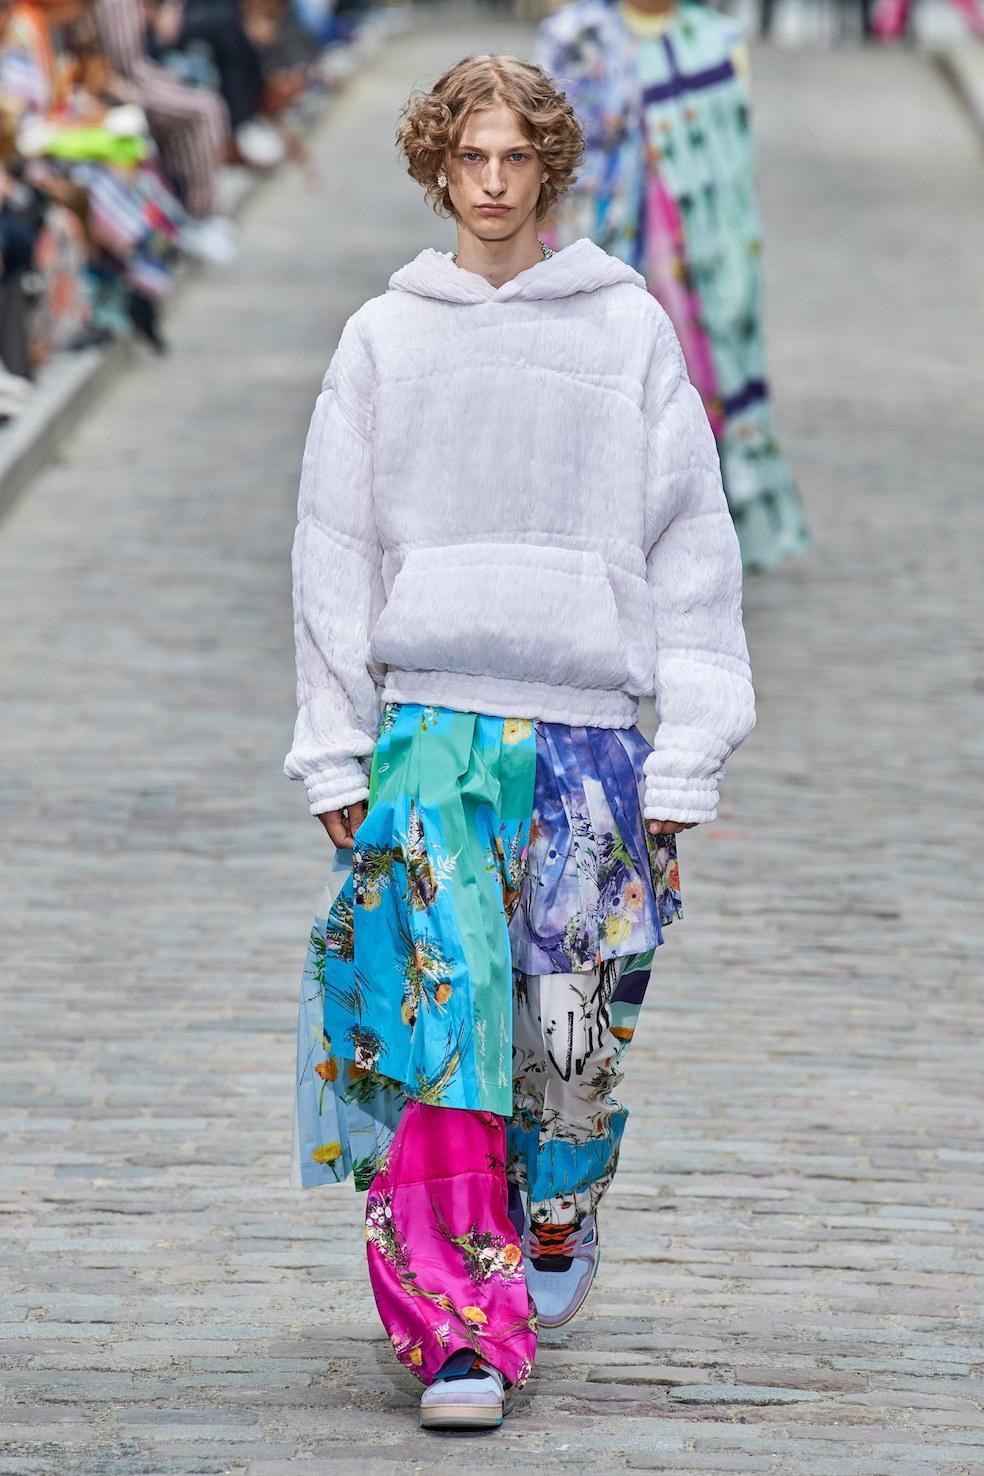 Louis_Vuitton_SS20_Behind_The_Blinds_Magazine__FIO0233.jpg